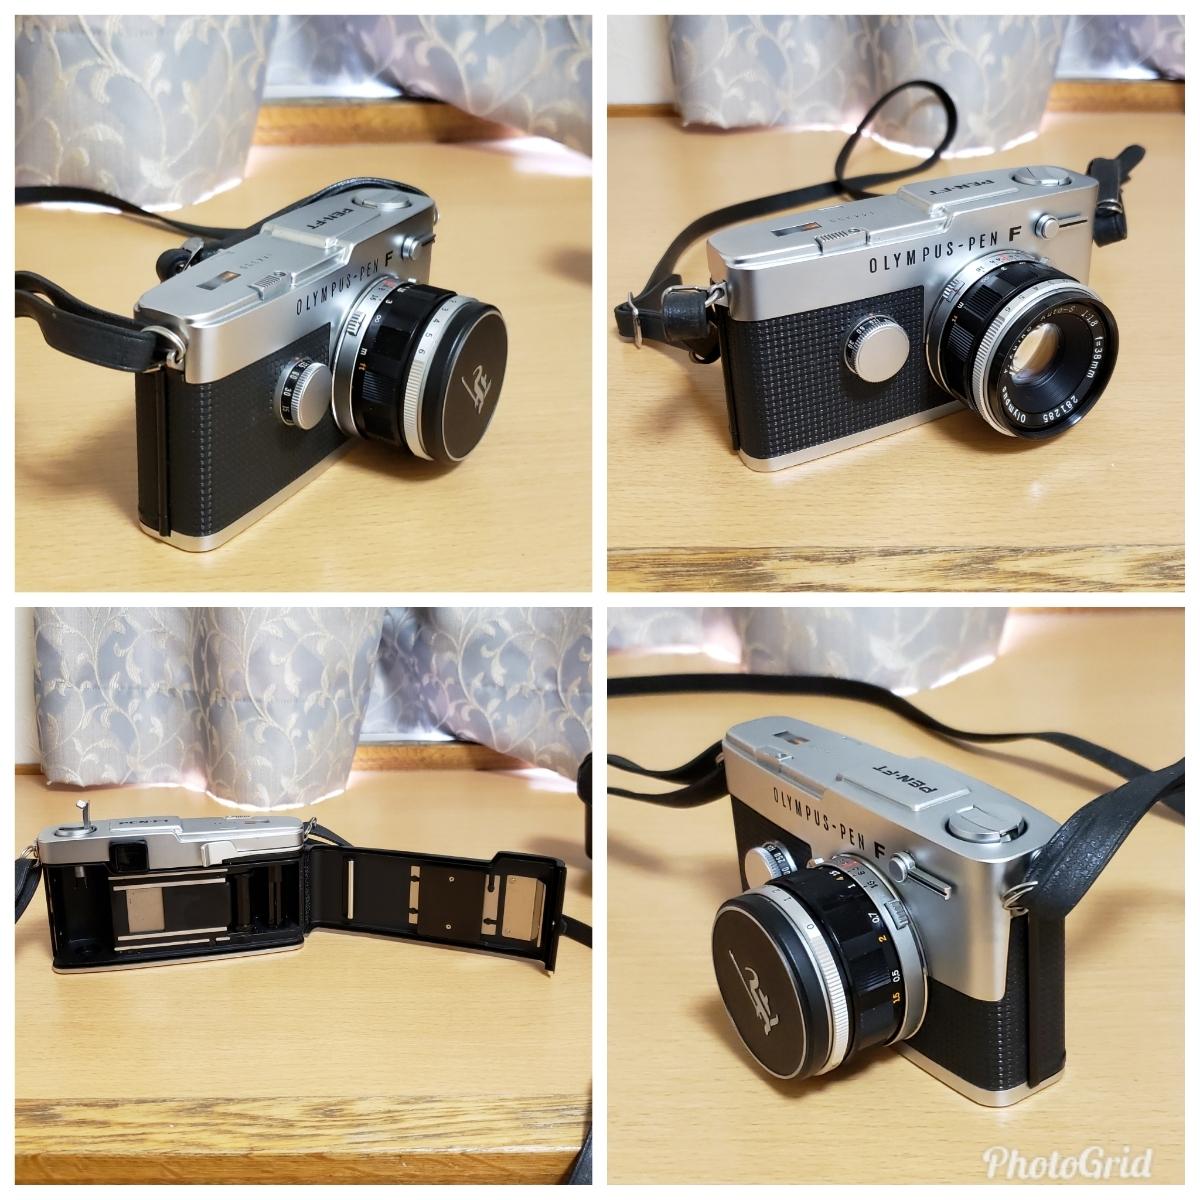 OLYMPUS PEN-FT F.ZUIKO Auto-S 1:1.8 f=38mm オリンパス フイルムカメラ ケース付 中古_画像10